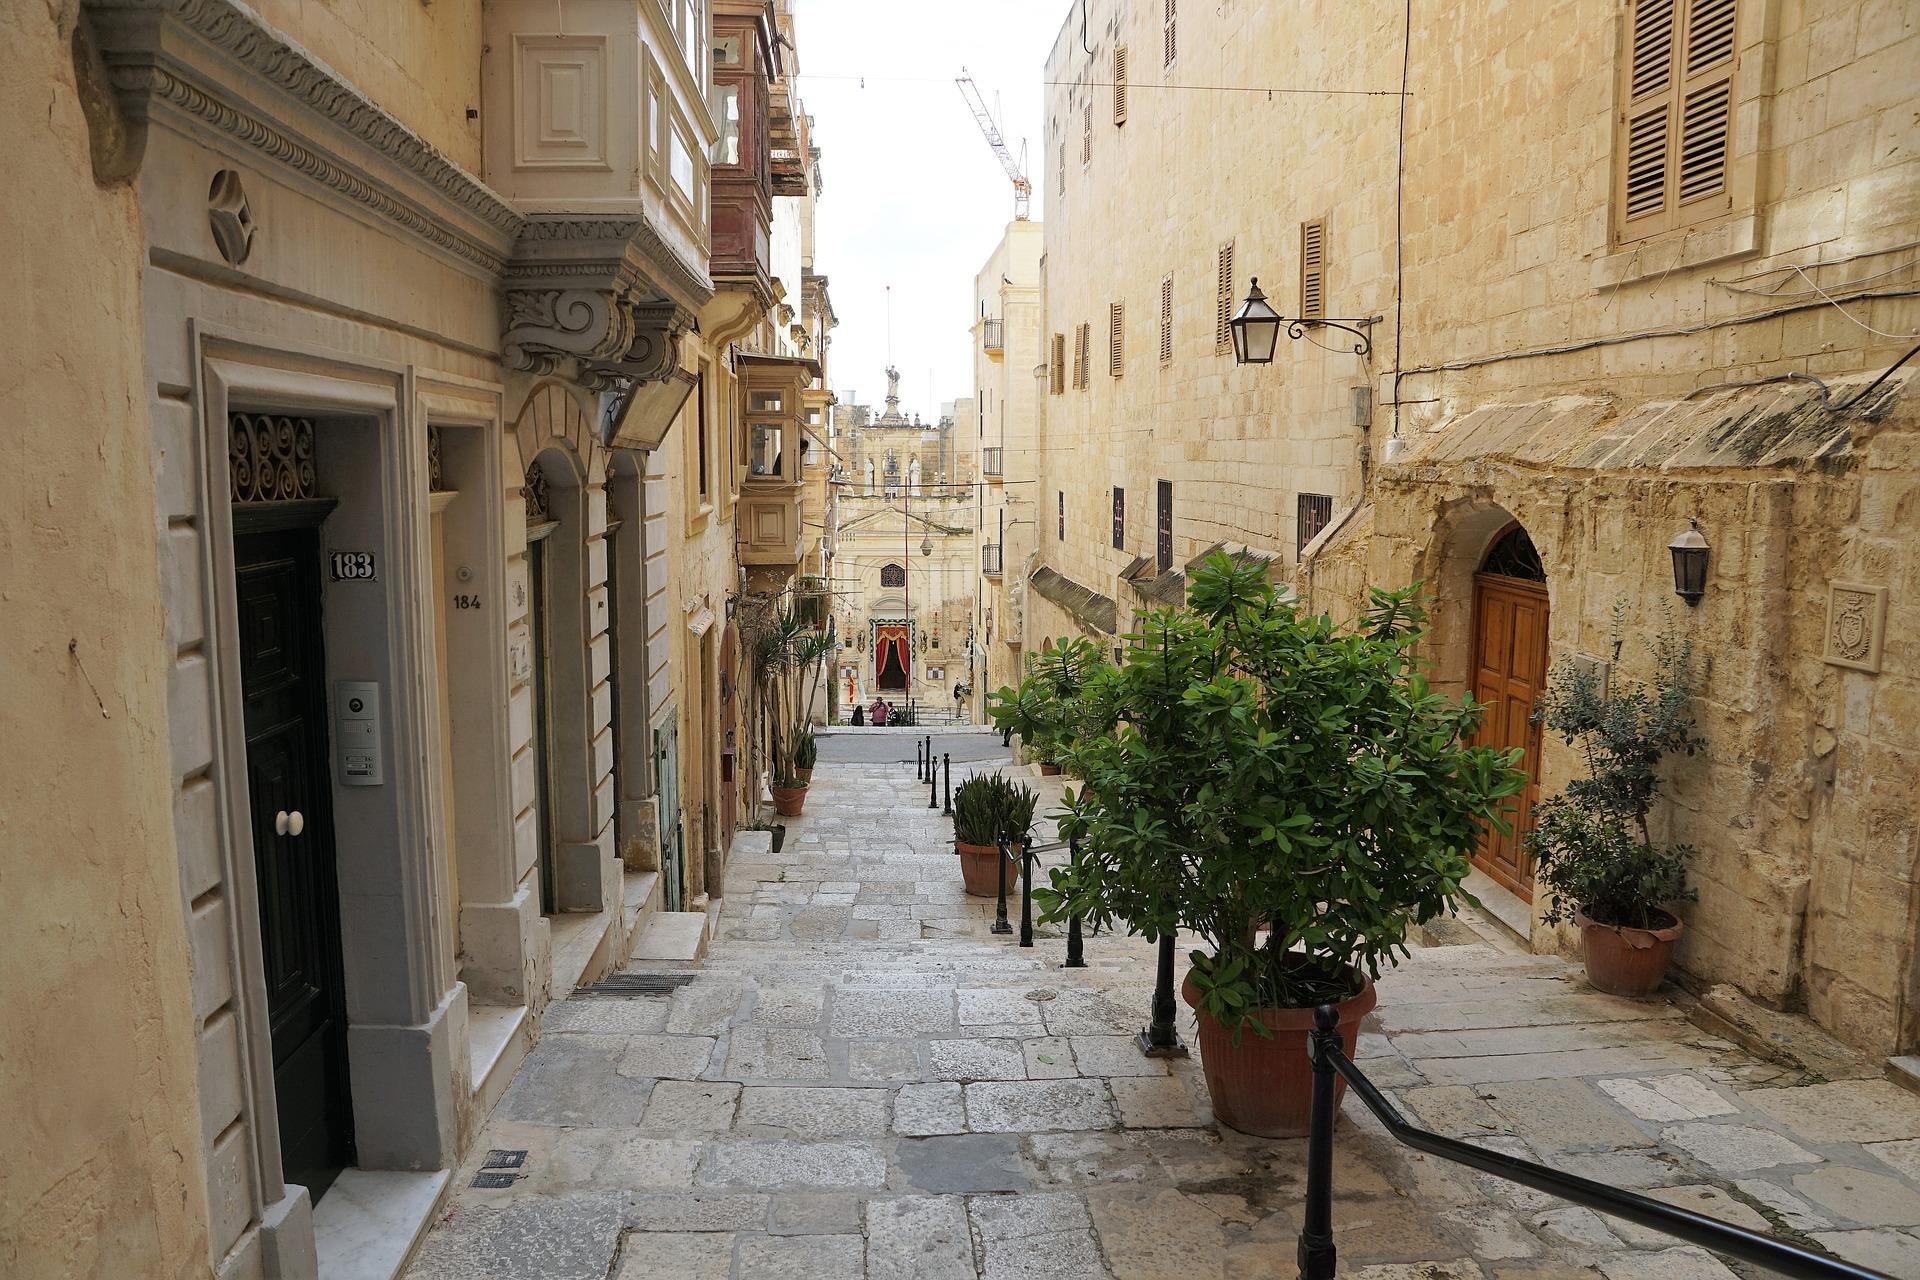 Road in Valletta, Malta